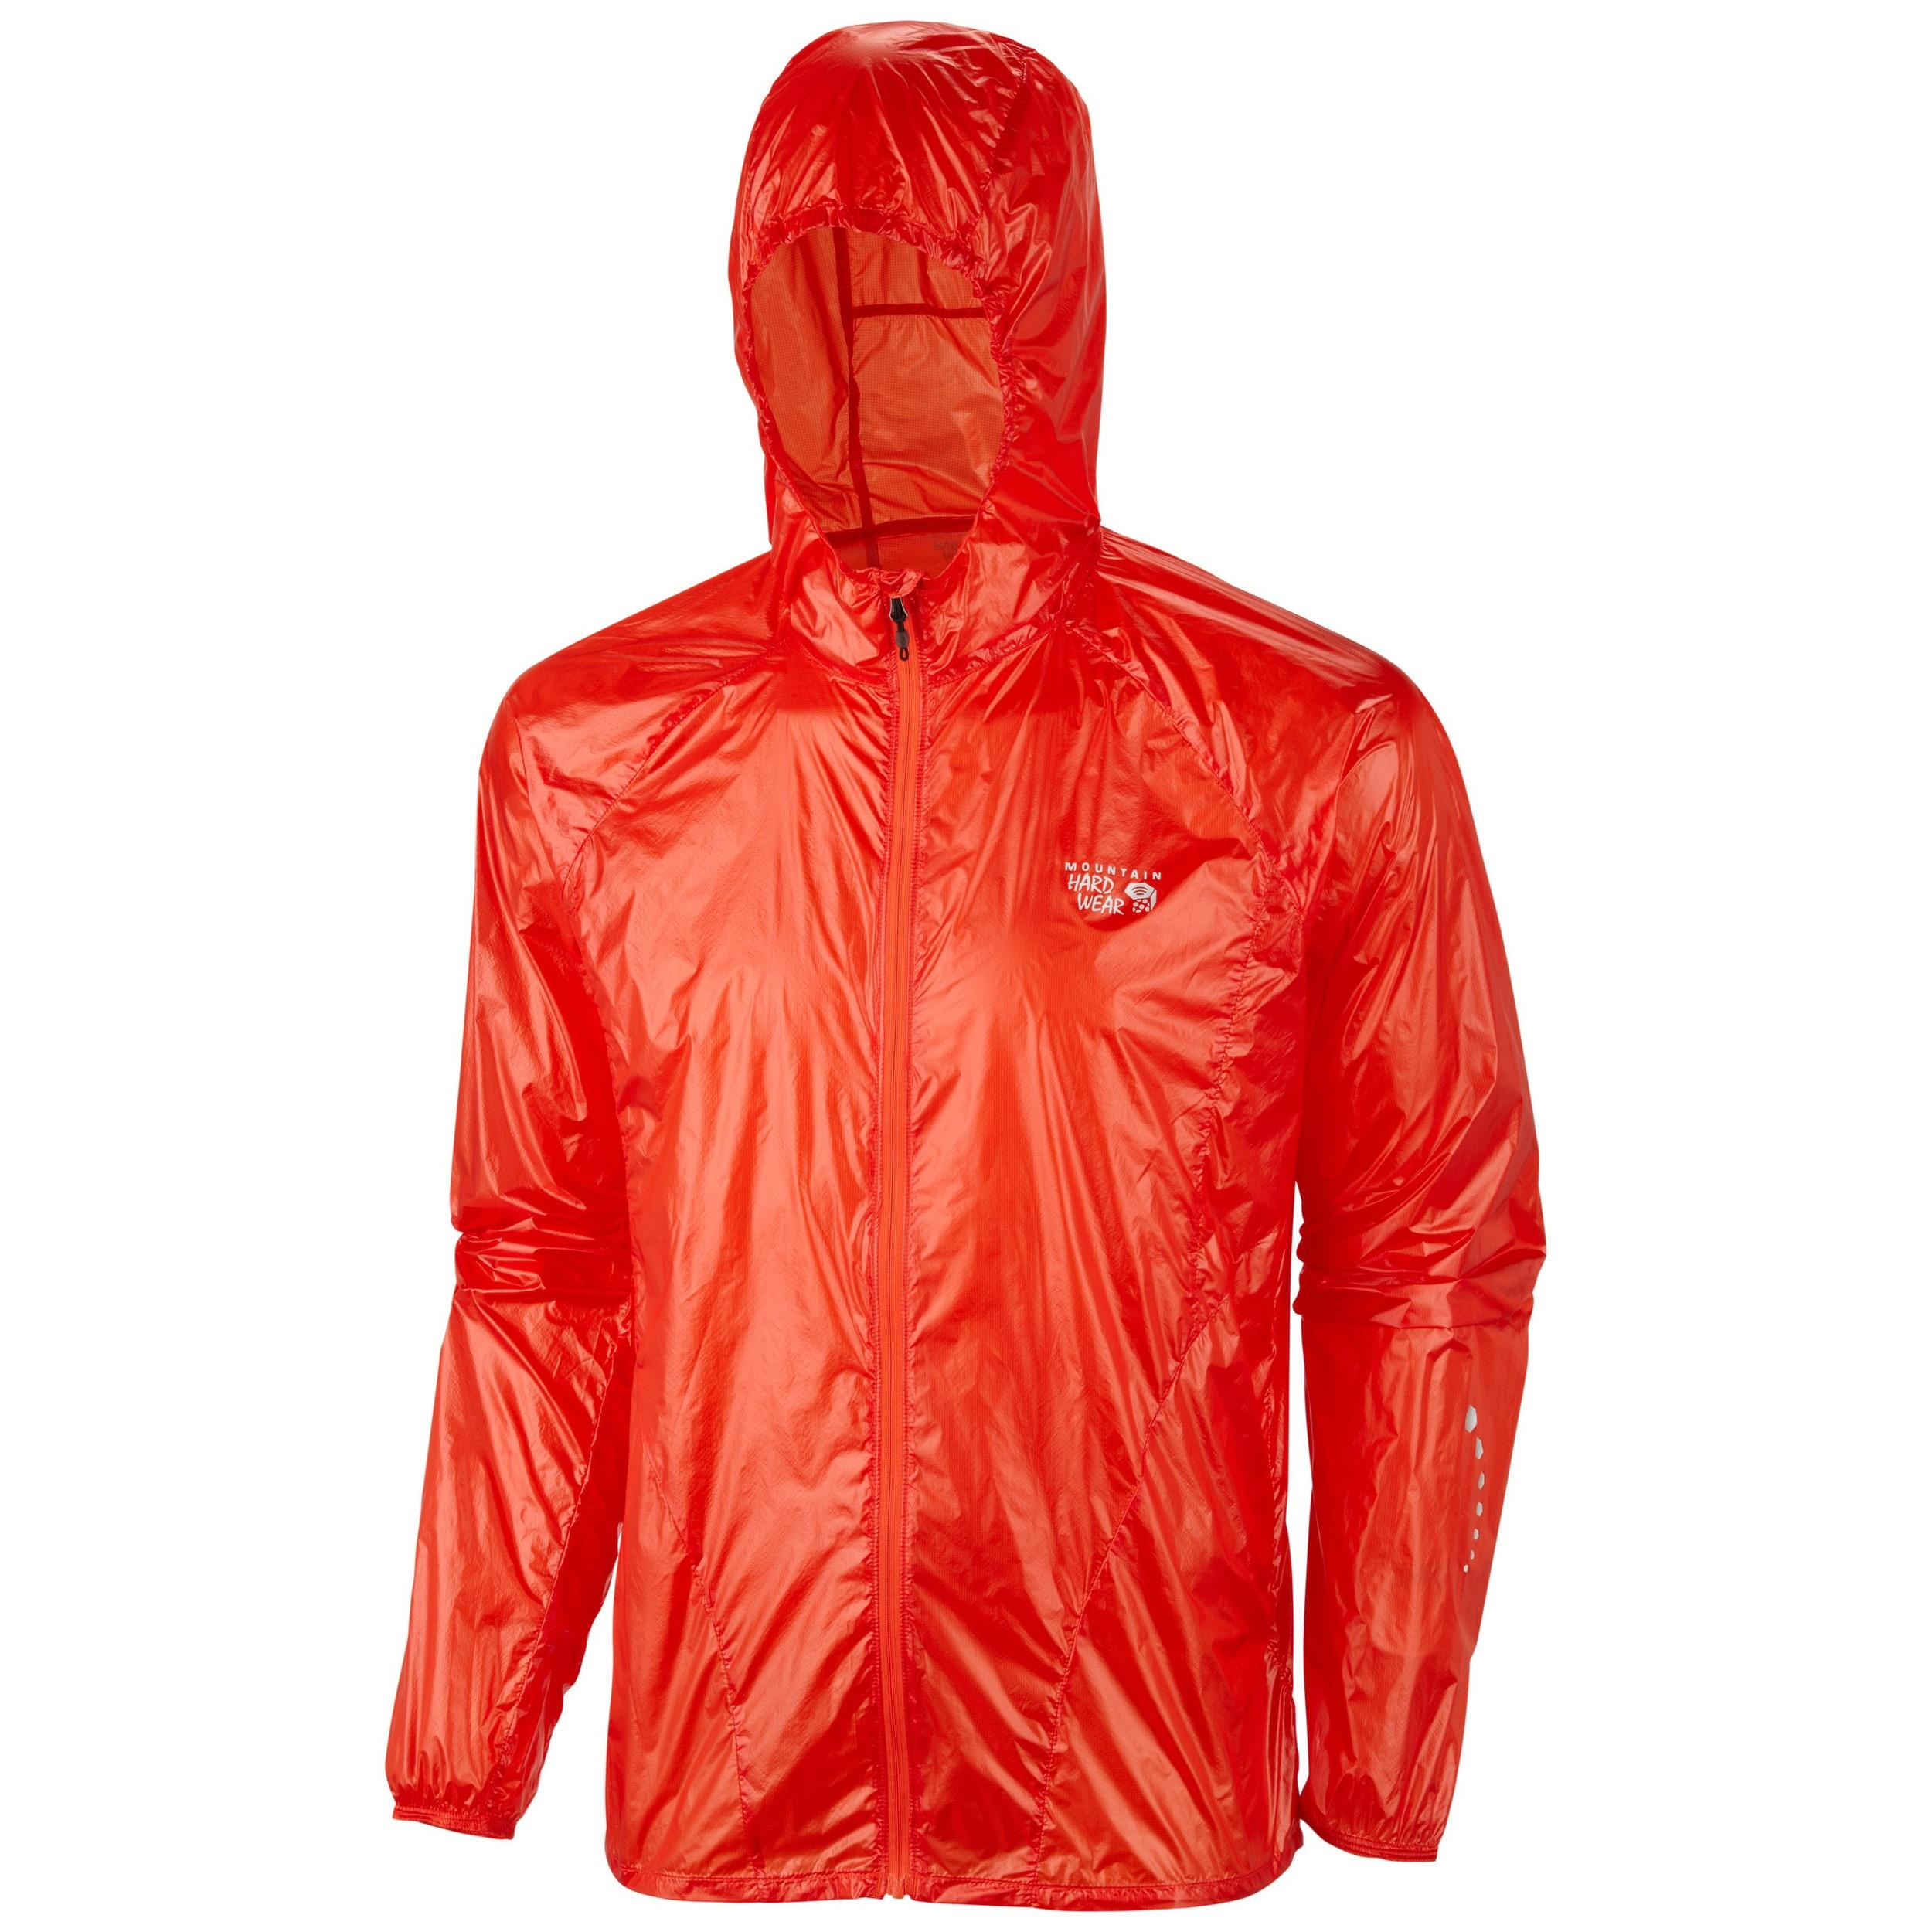 Wind Layer  Men's Ghost Whisperer™ Hooded Jacket